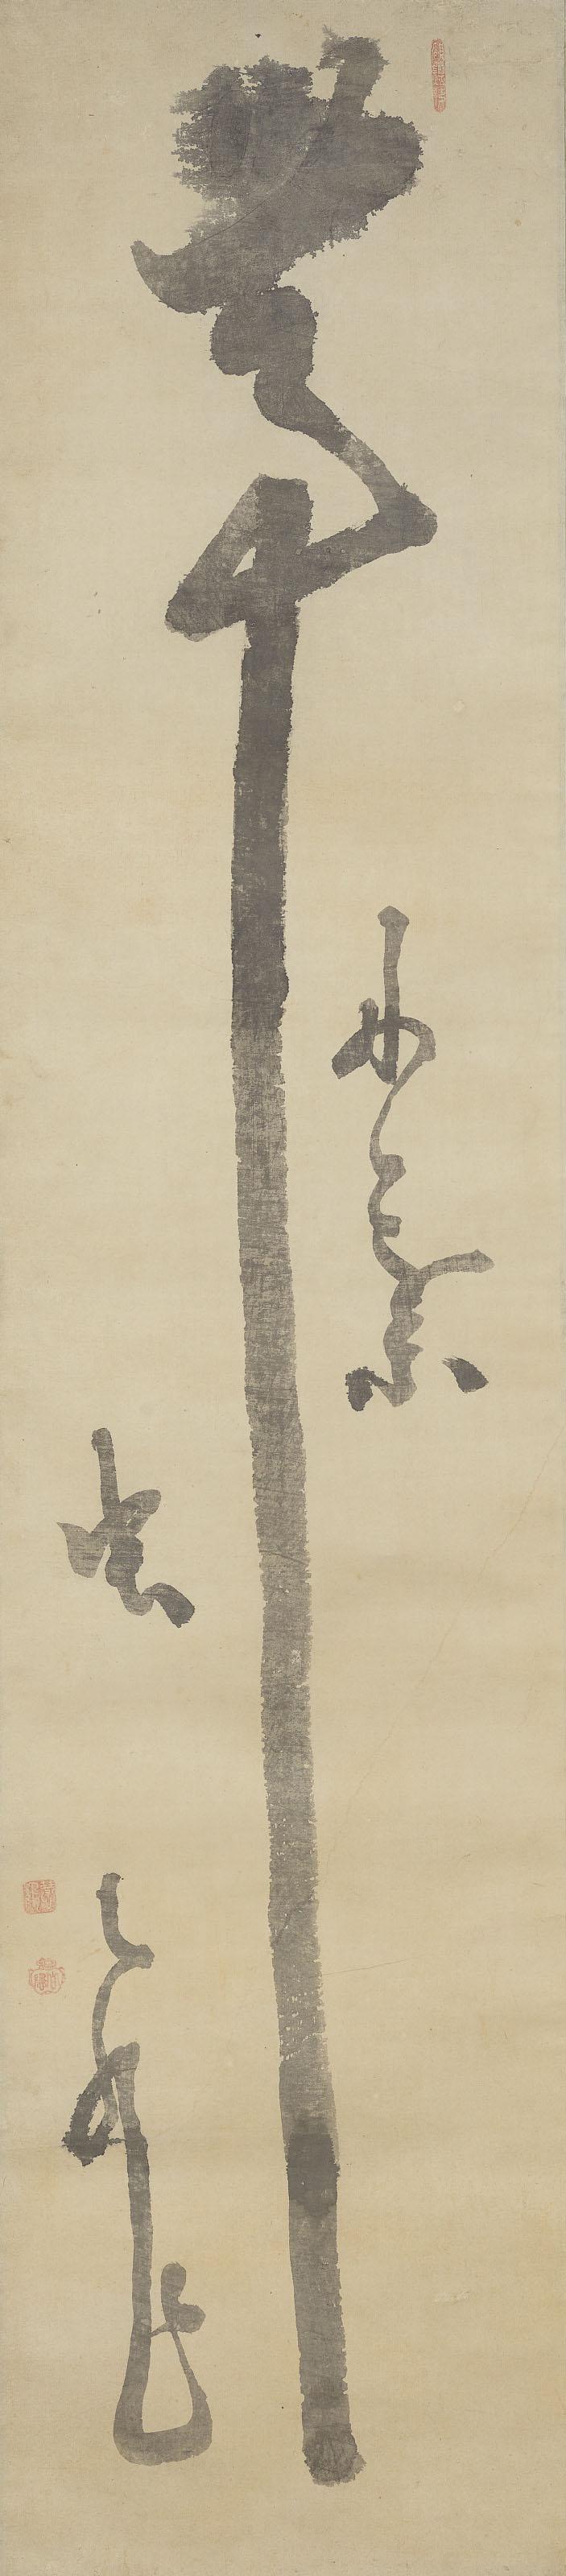 HAKUIN EKAKU (JAPAN, 1685-1769)